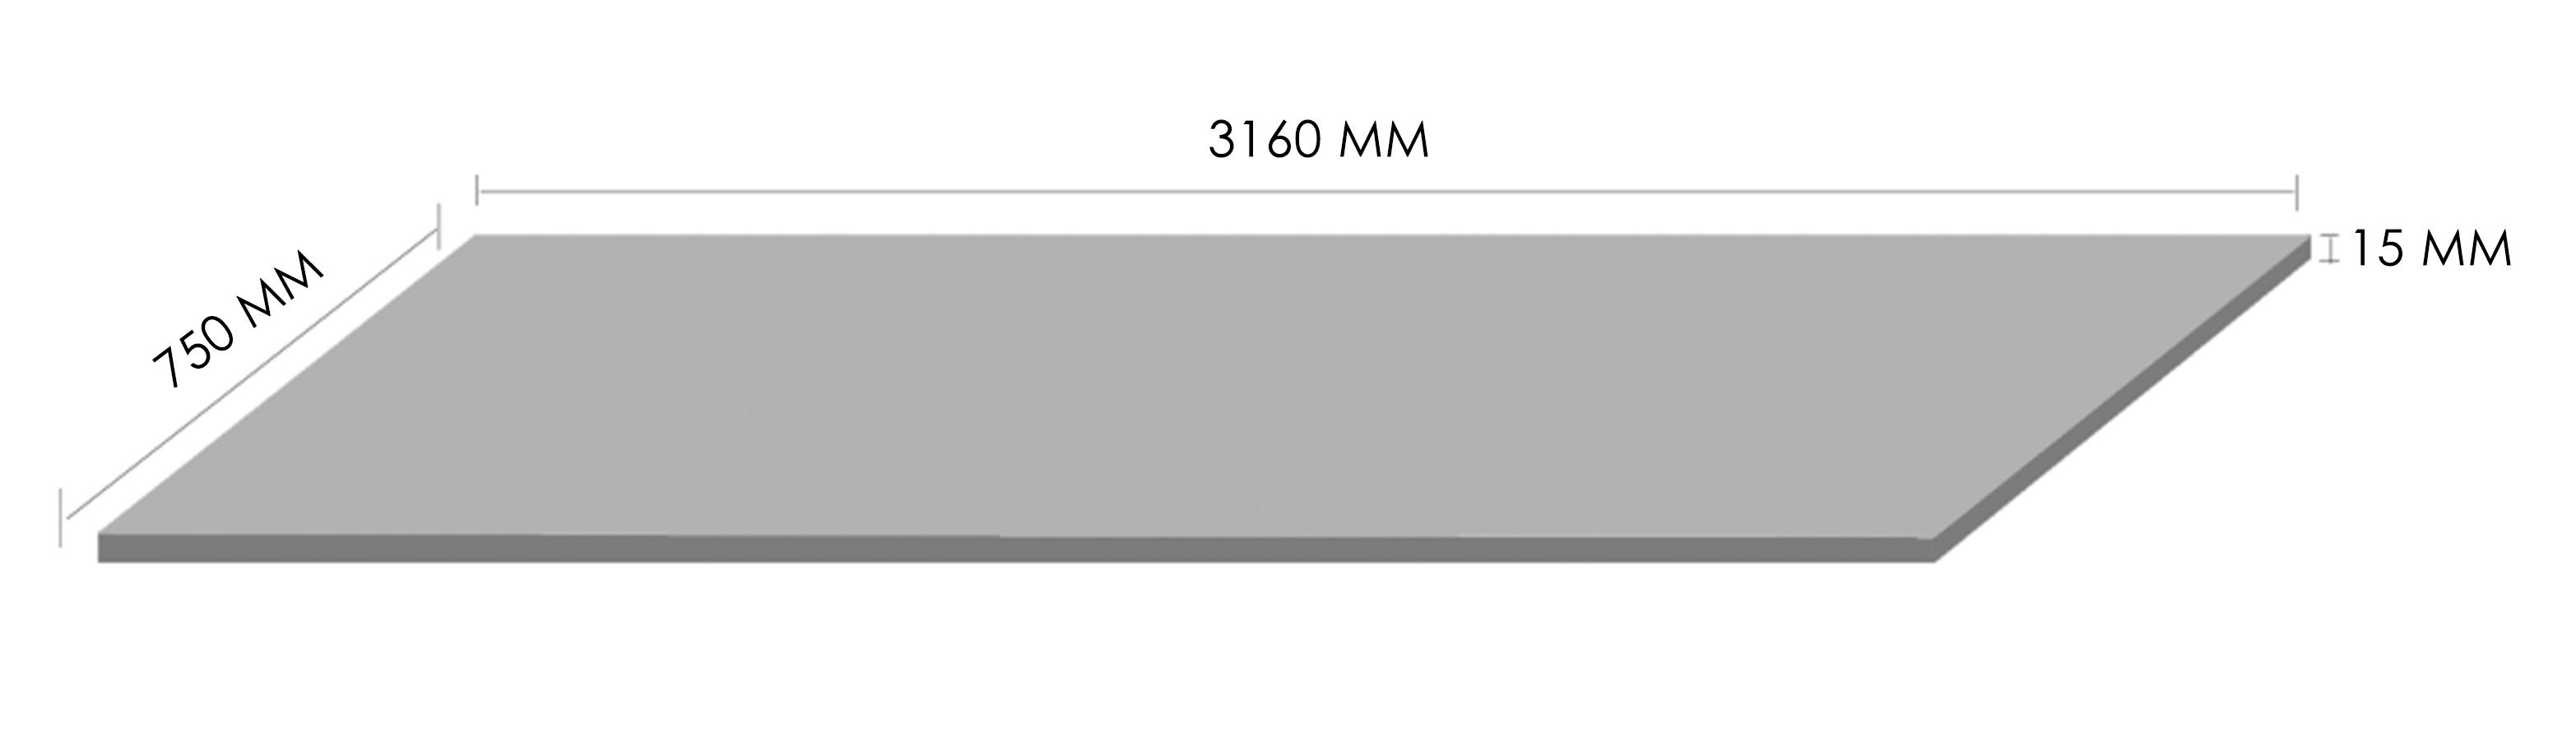 Markee Absolute Quartz Slab Dimension